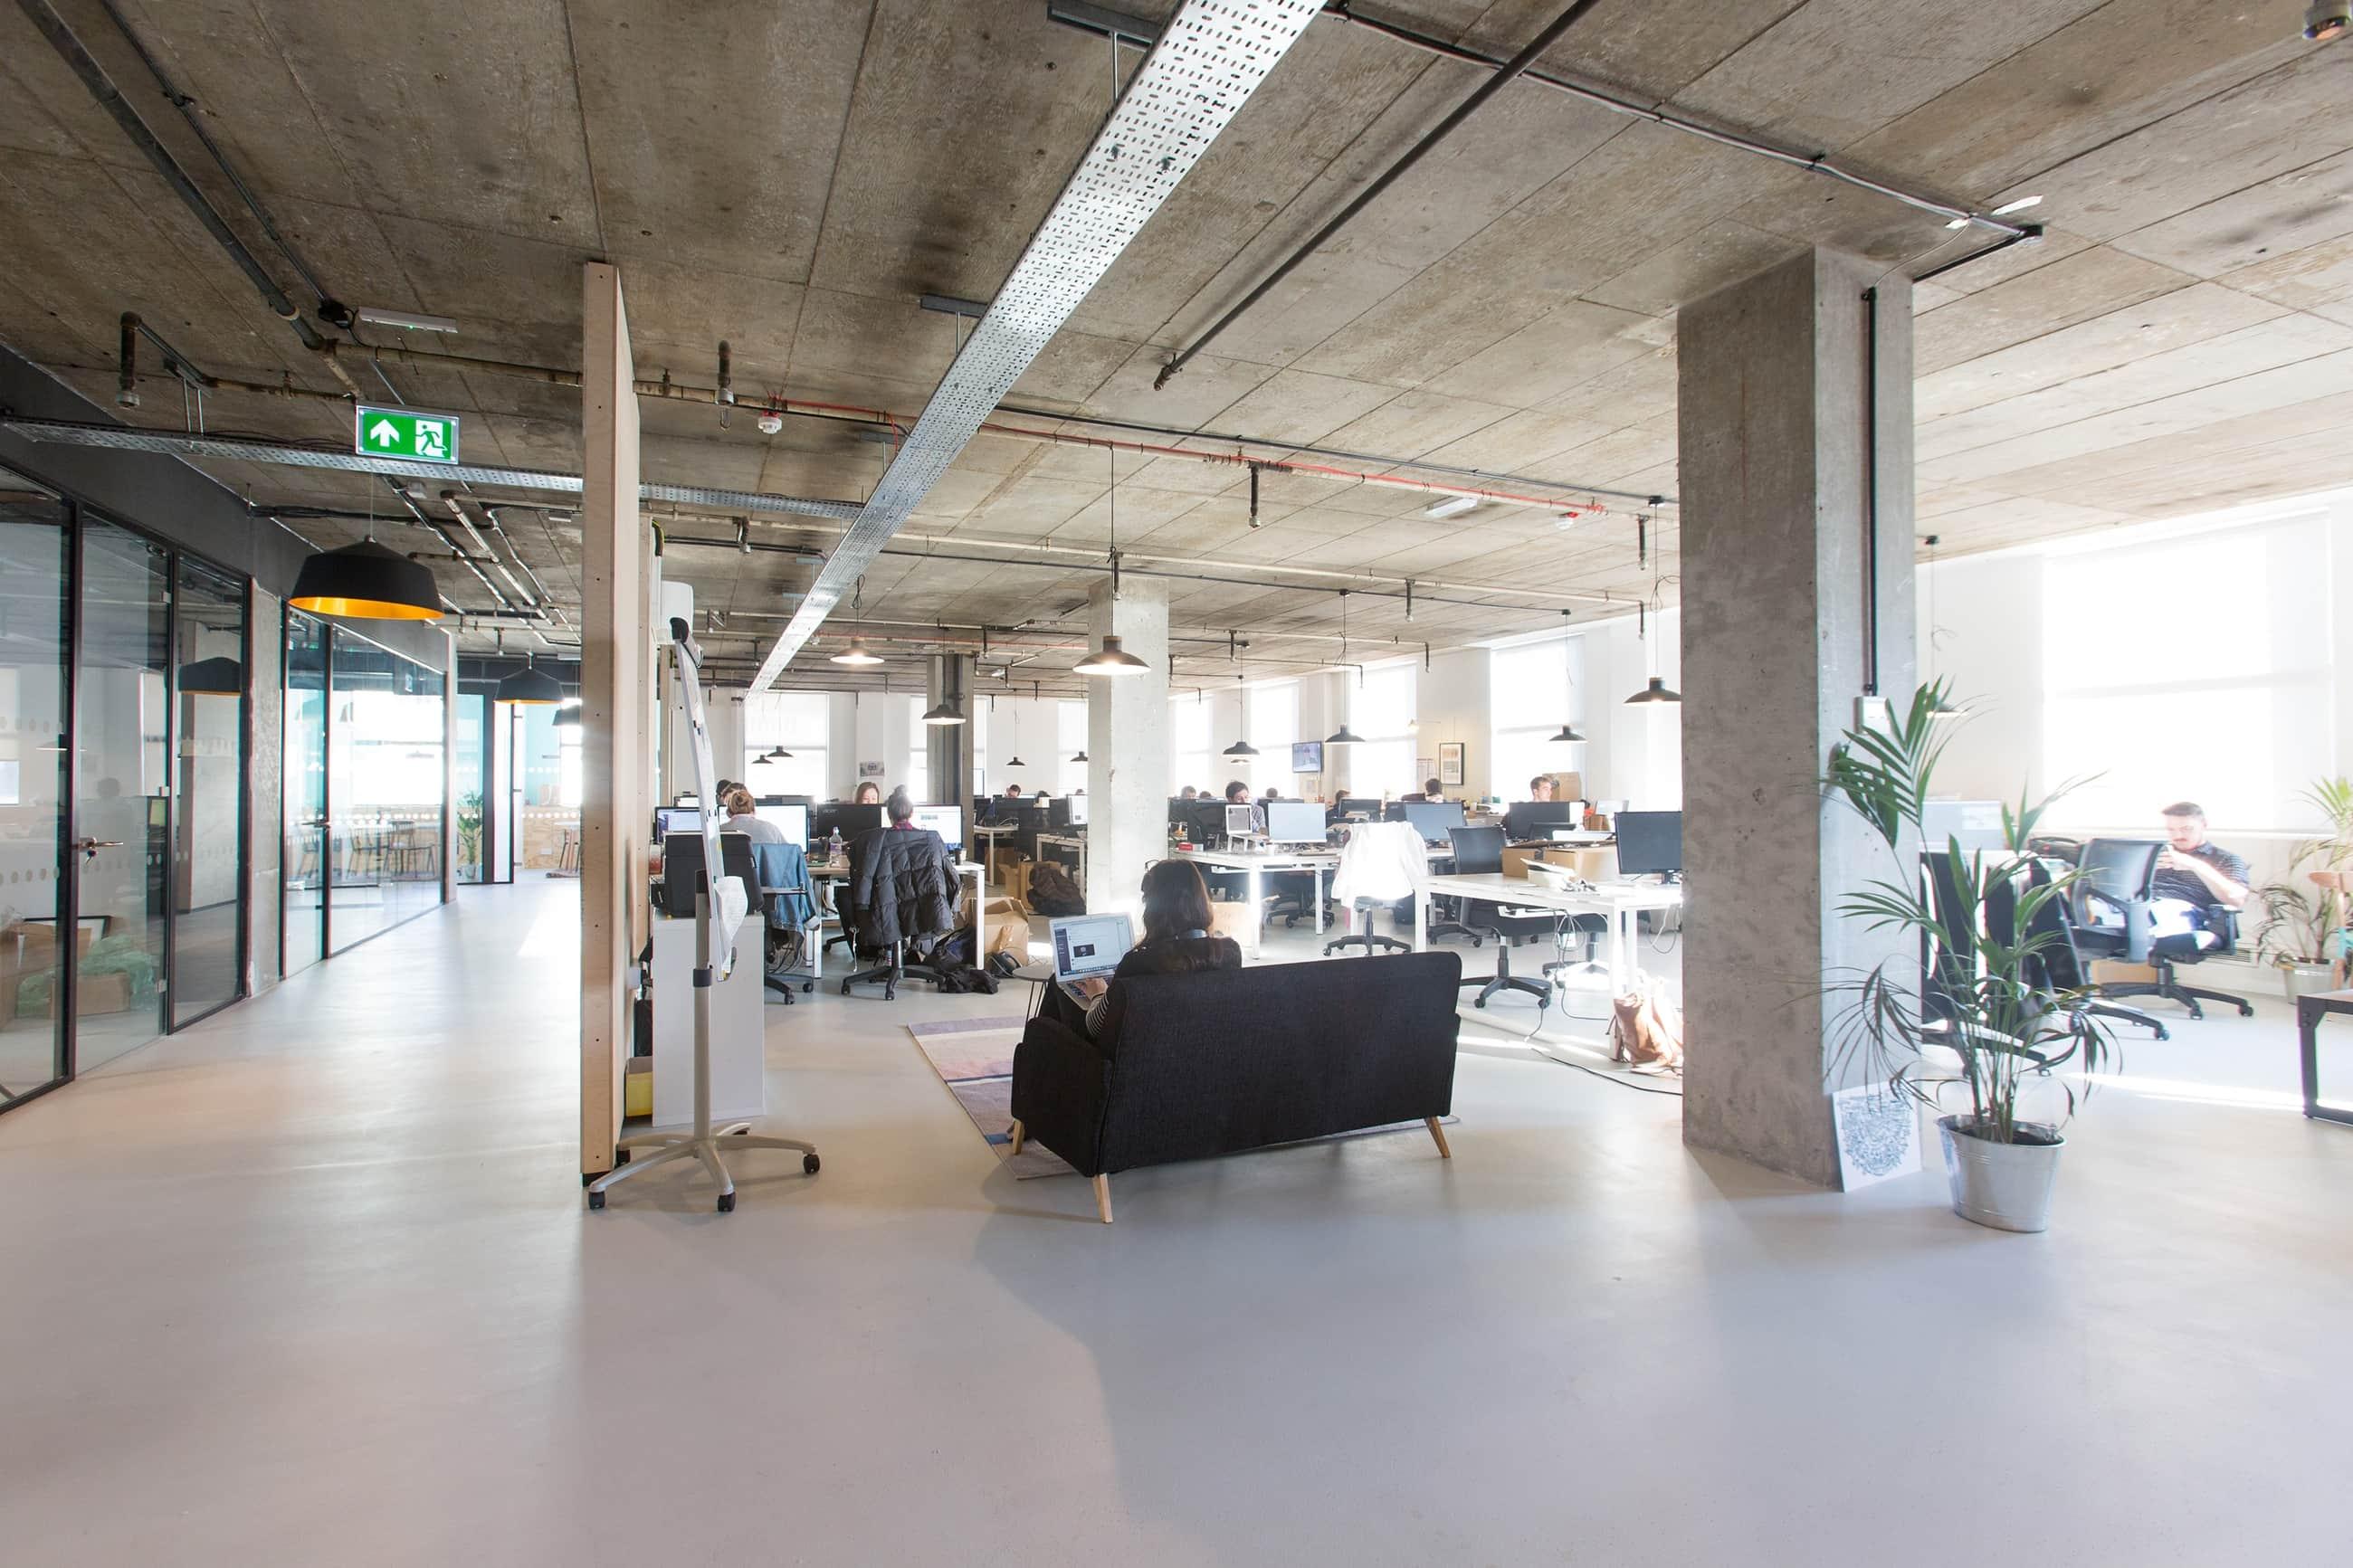 78 person workspace